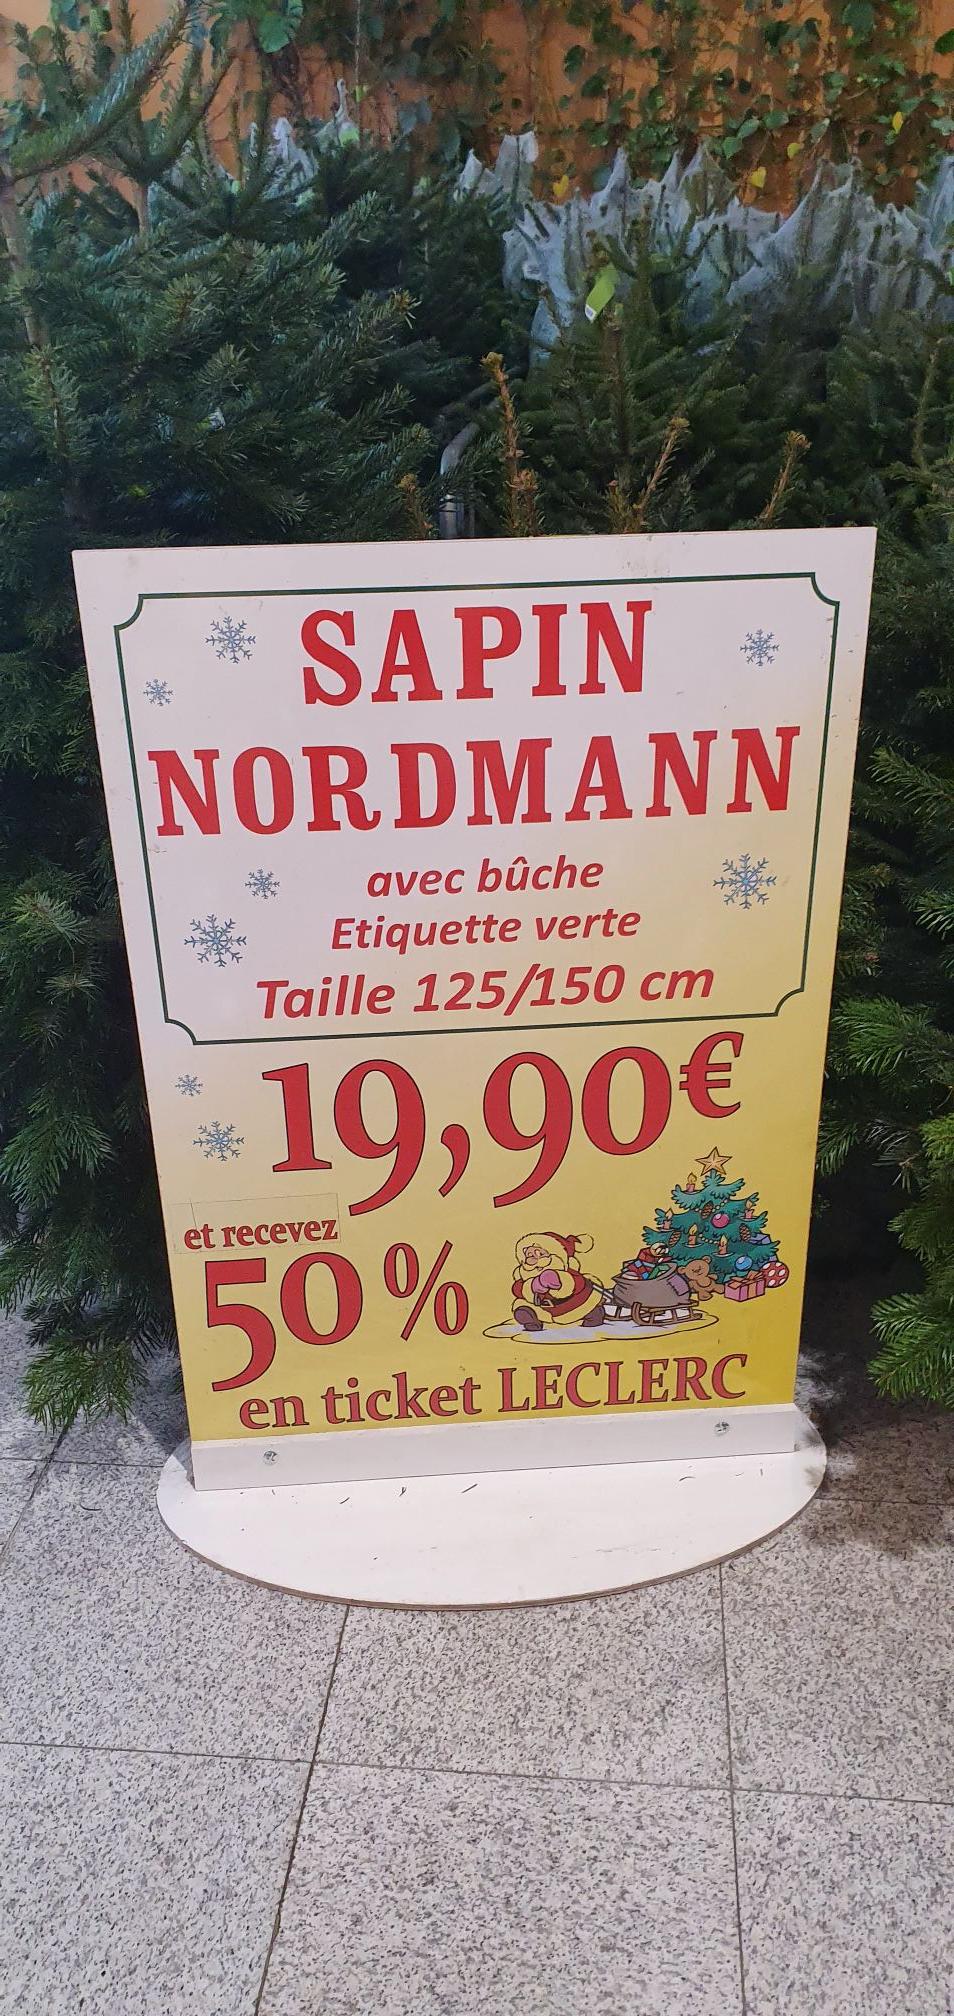 Sapin Nordmann 125/150Cm (+9.95€ en bon d'achat) - Clermont-Ferrand (63)